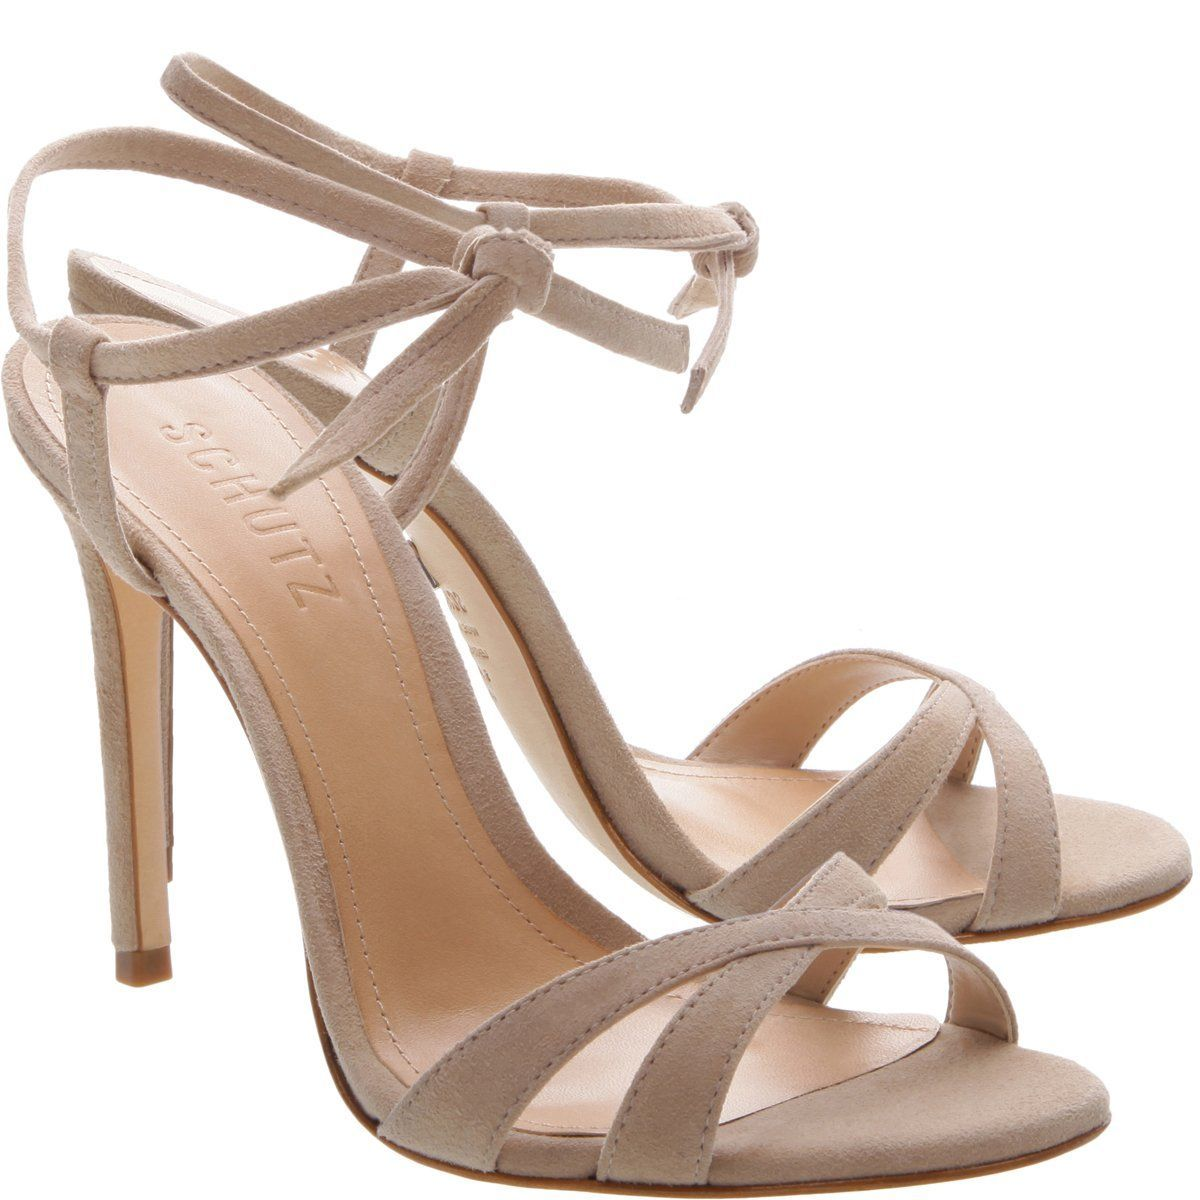 LALA IKAI Women Shoes High Heel Brand Fashion Pointed Toe